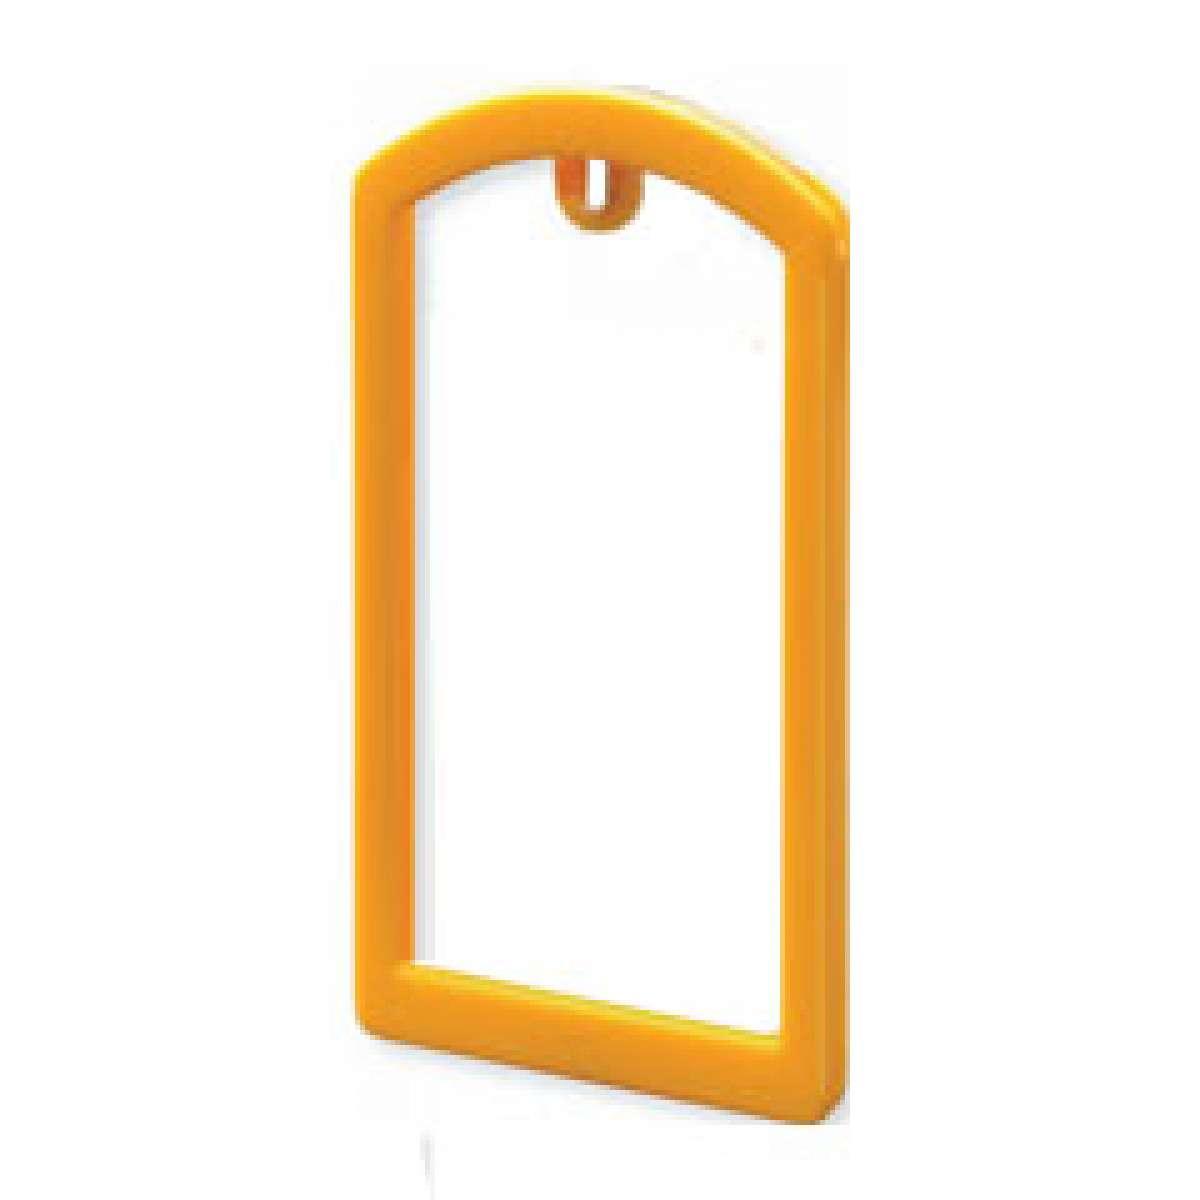 Label Pocket Frame (Yellow)